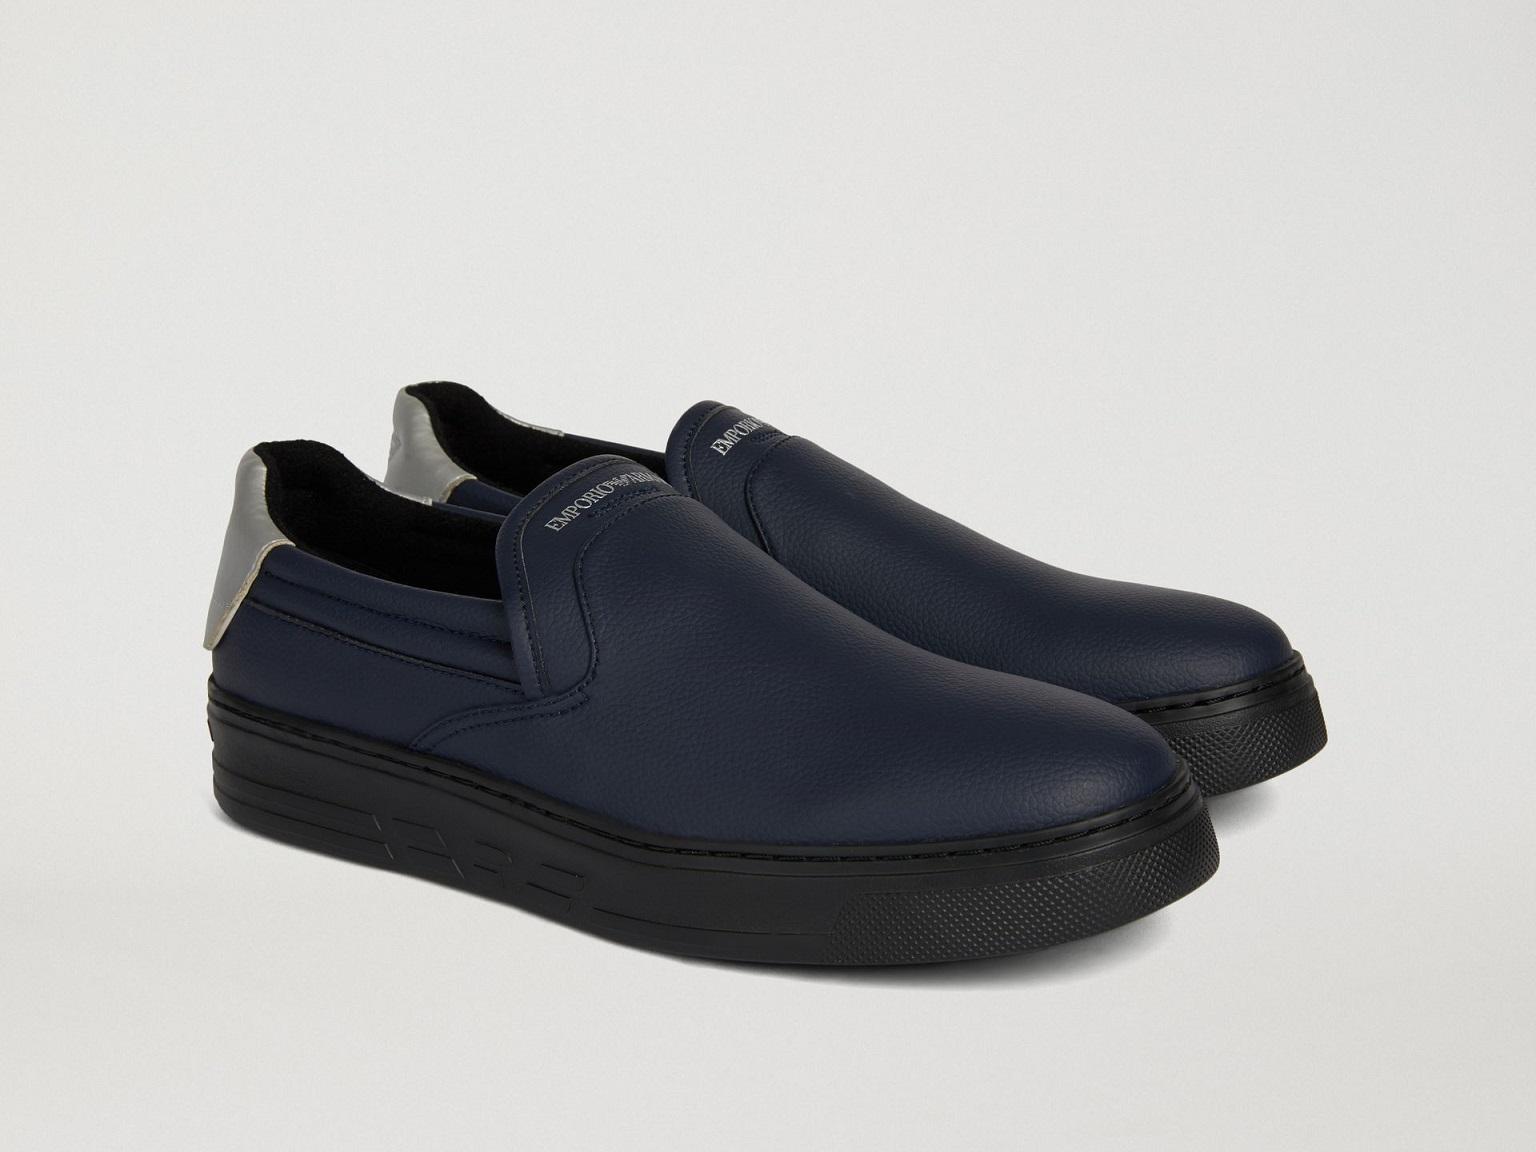 Chaussures   tennis pour Homme   Emporio Armani f03a13e2937